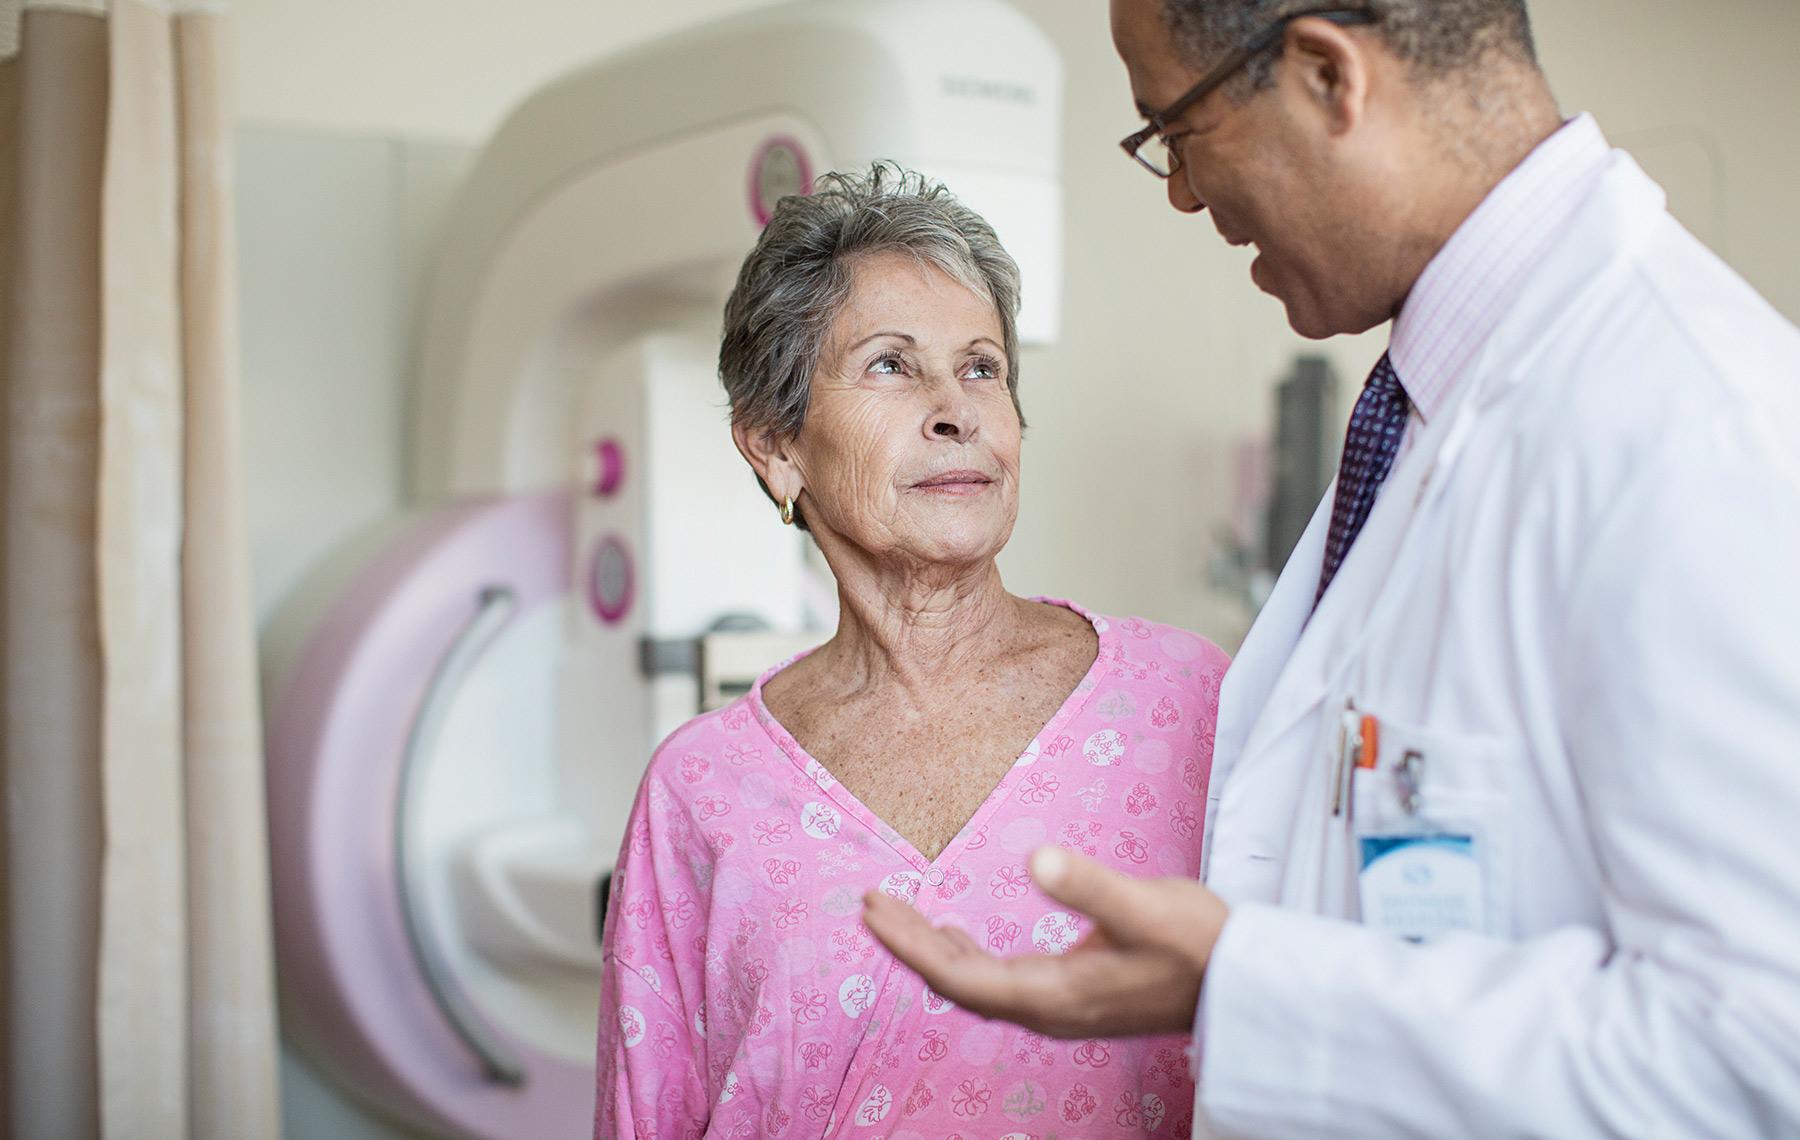 Cancer screening senior